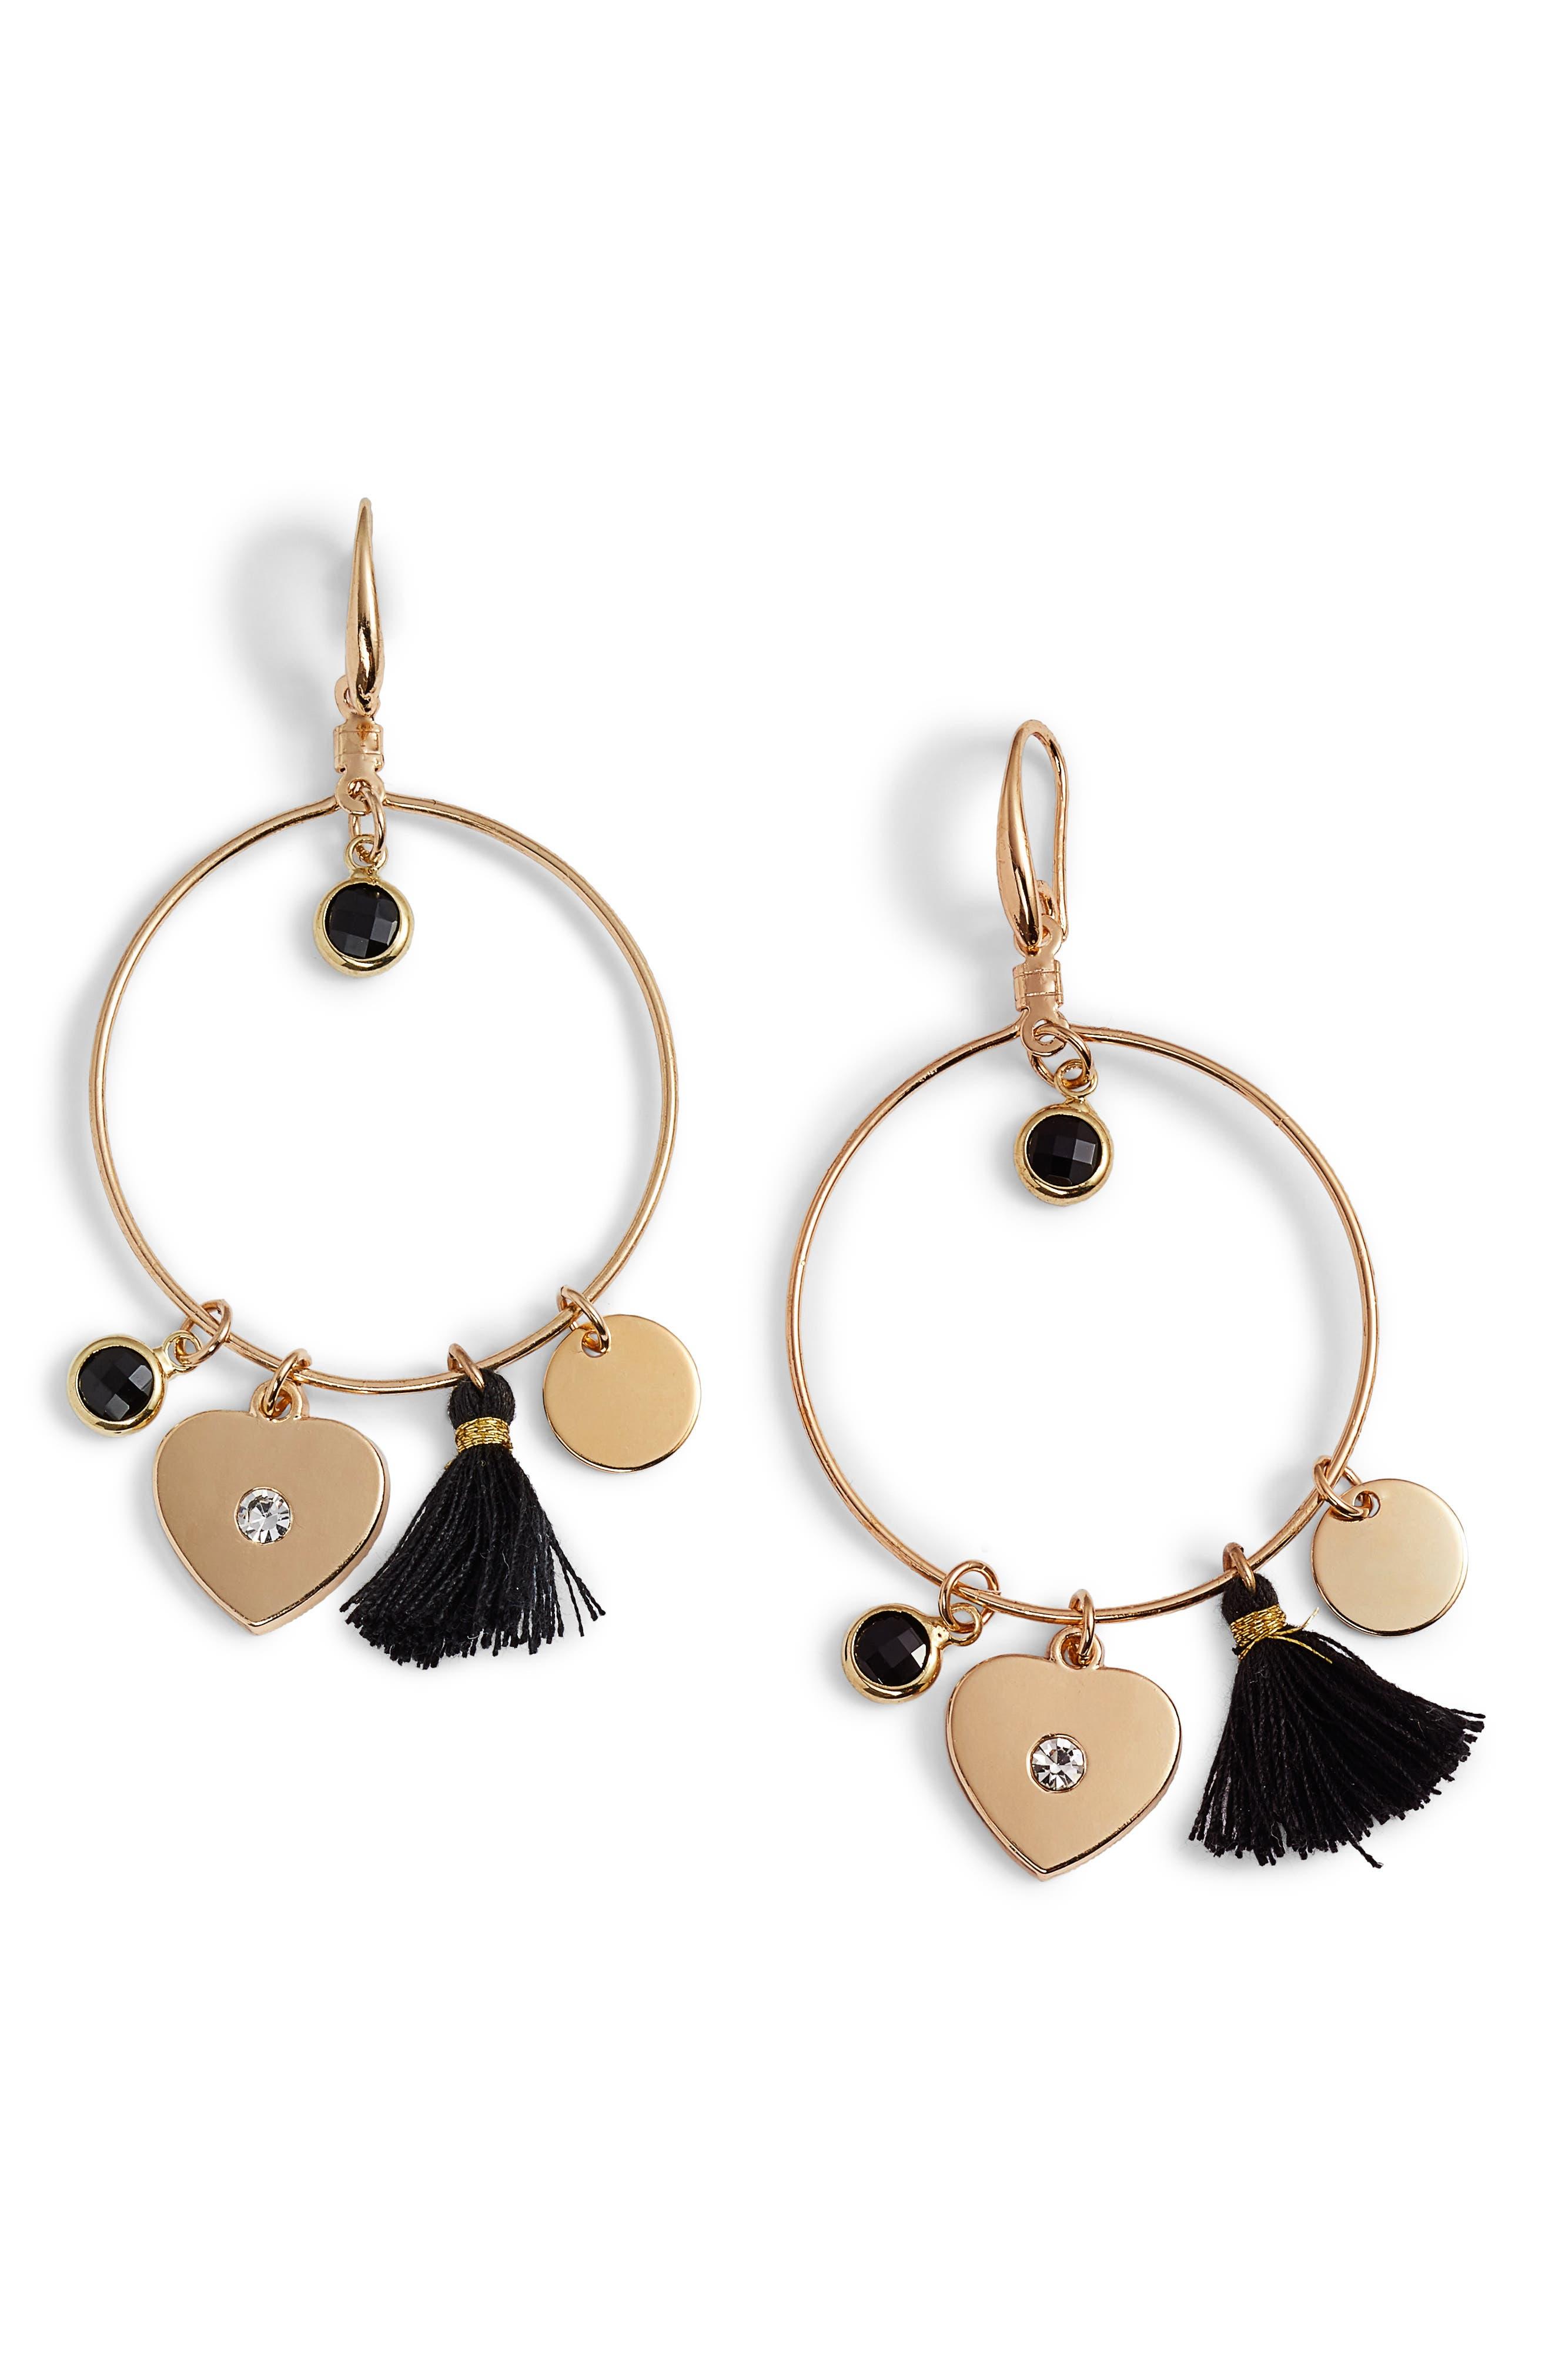 Samantha Tassel & Charm Hoop Earrings,                             Main thumbnail 1, color,                             Gold